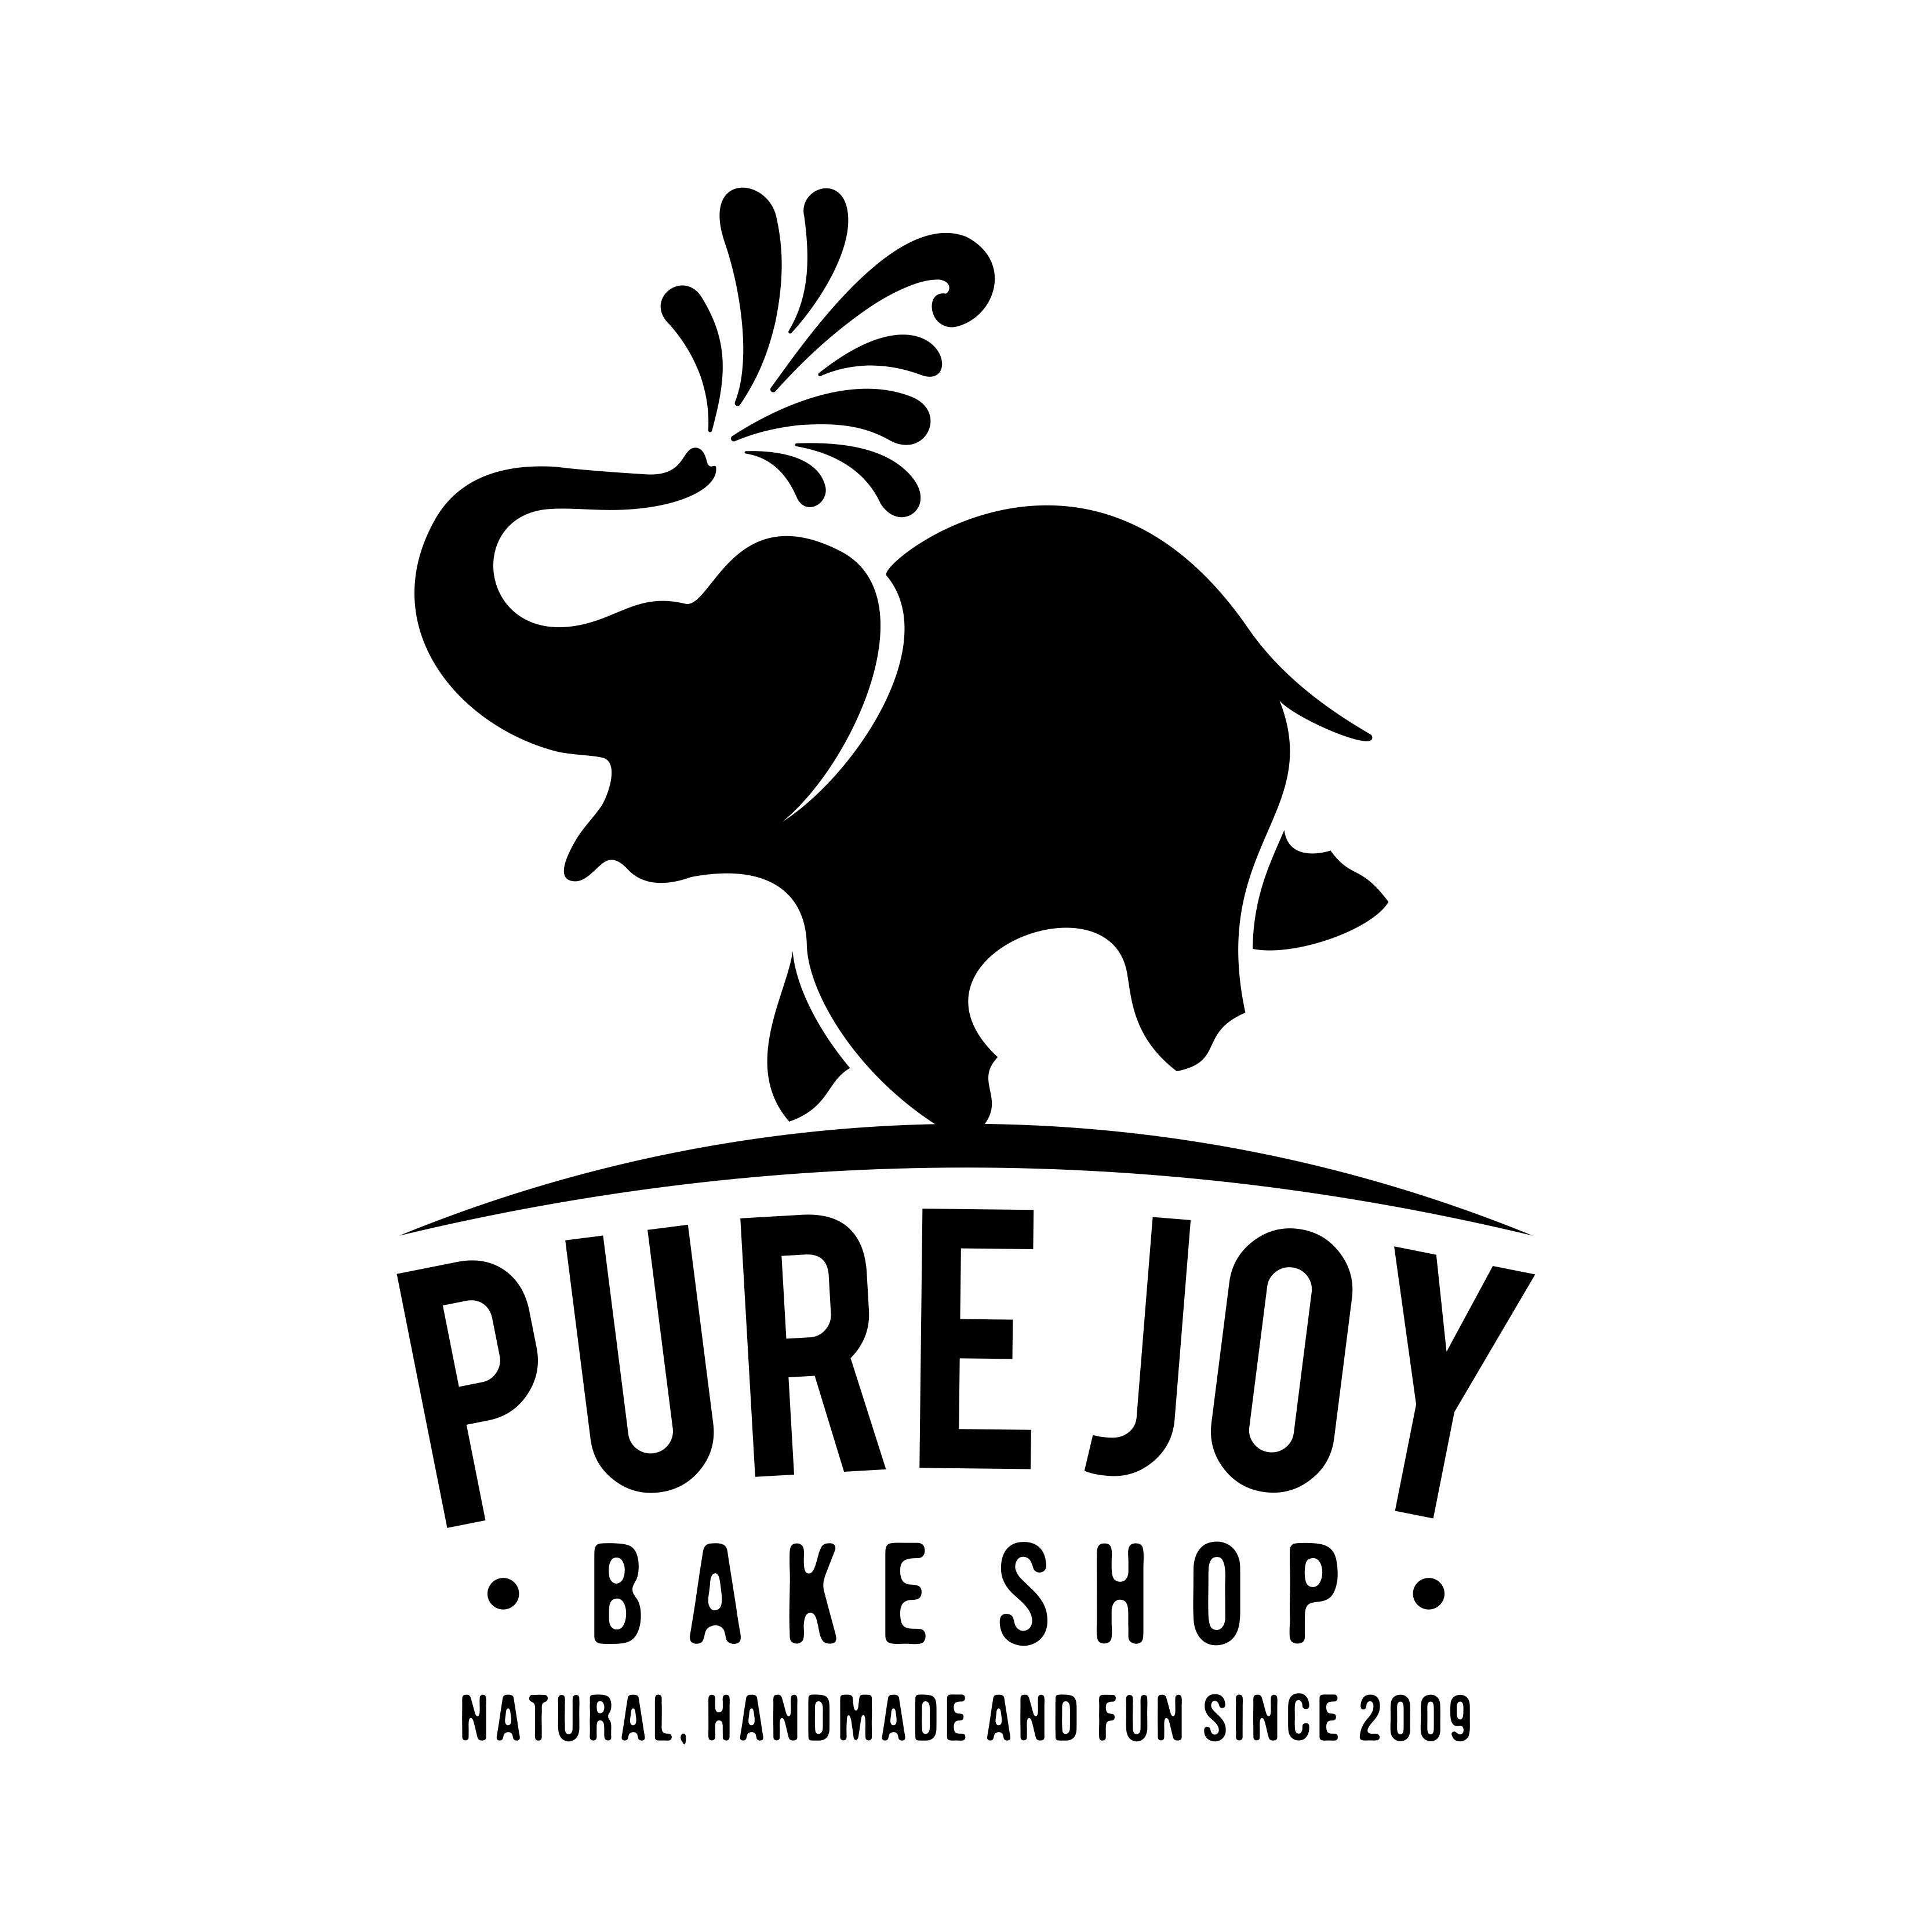 Pure Joy Bake Shop logo design